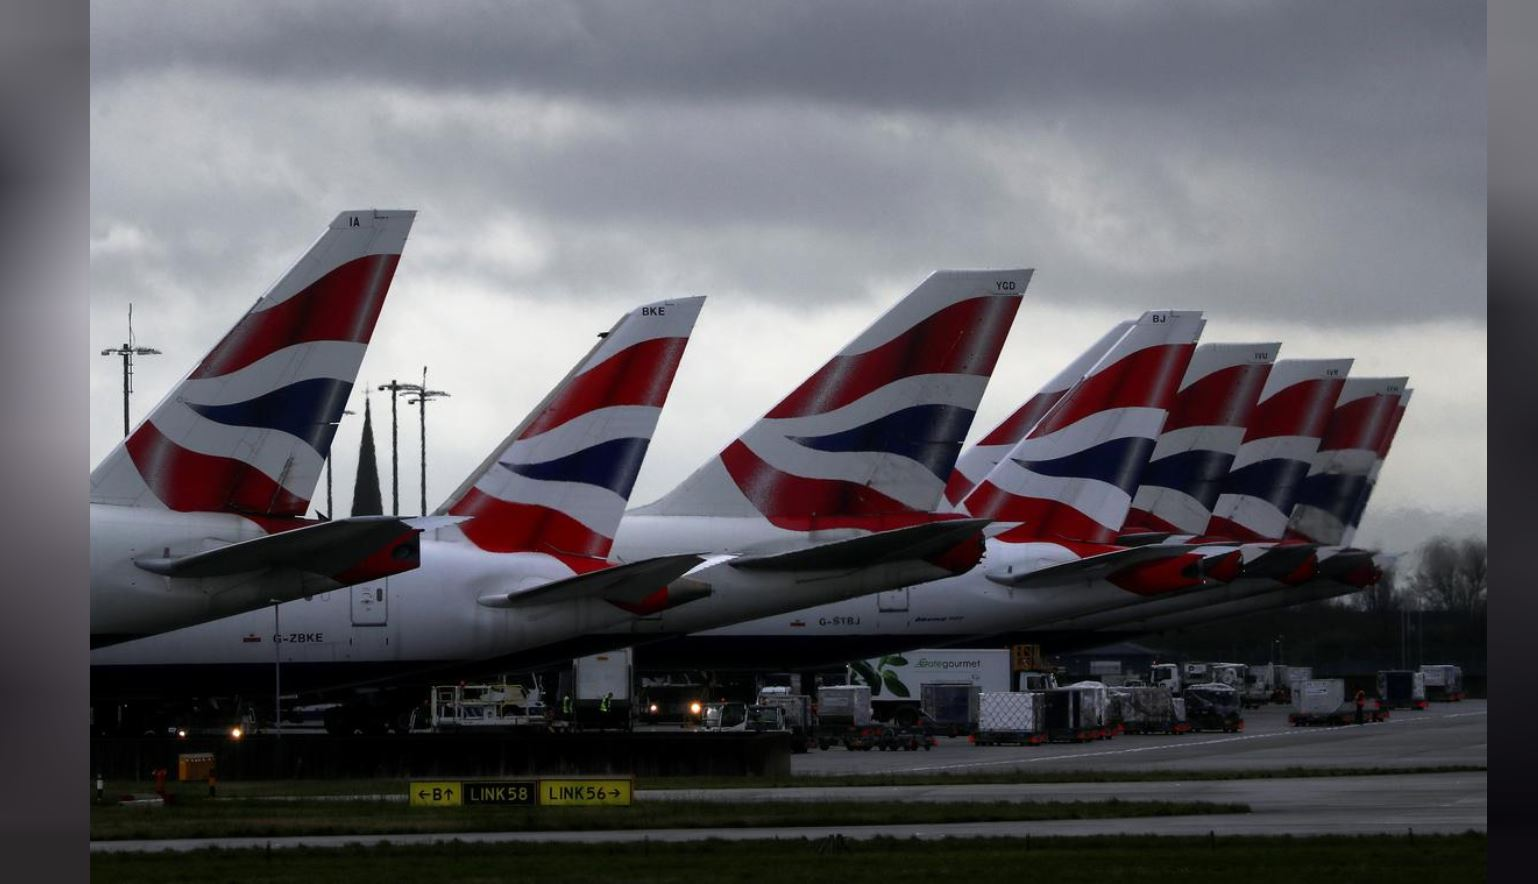 British Airways makes progress with job cuts